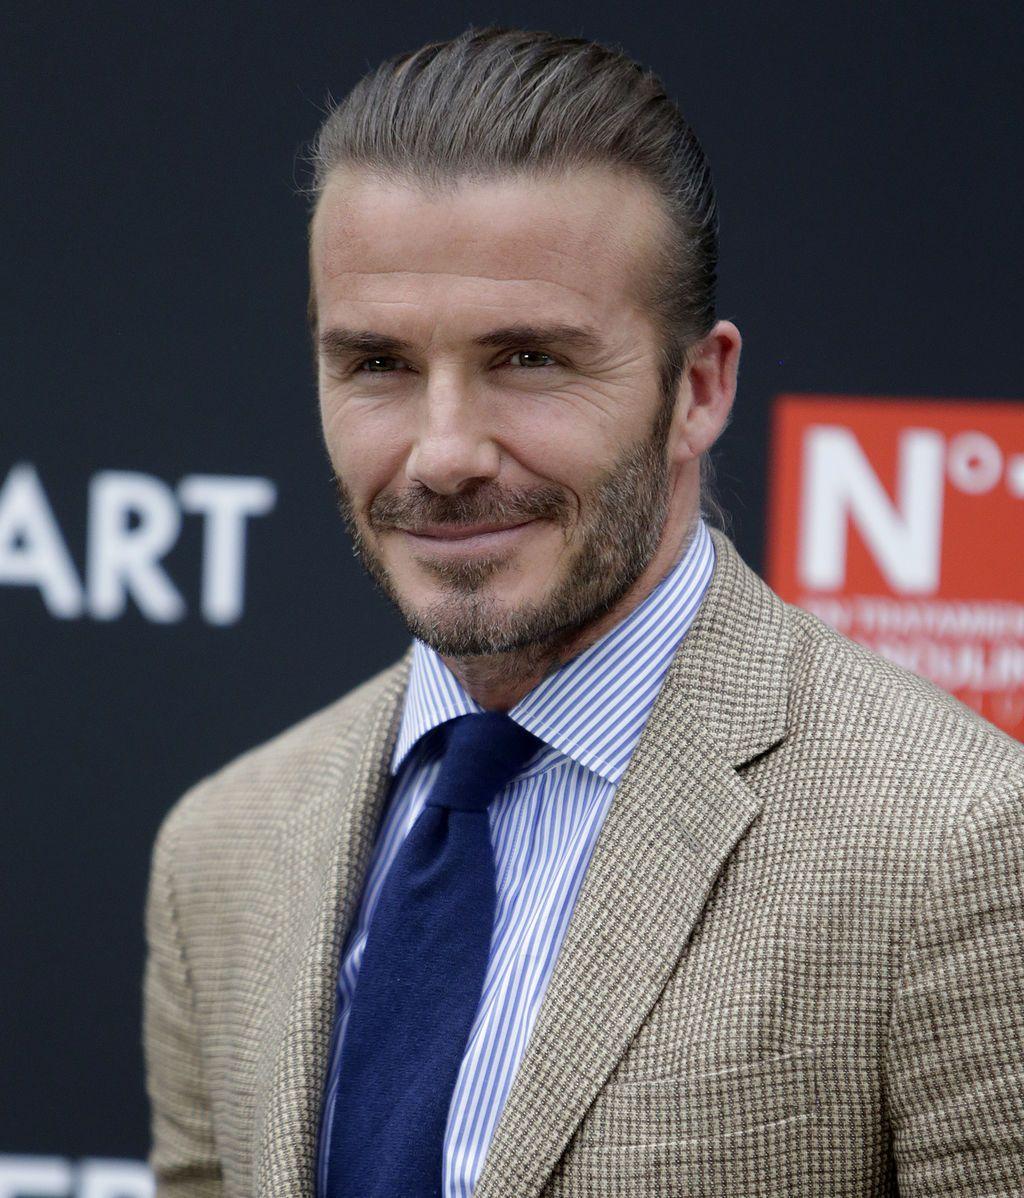 5. David Beckham